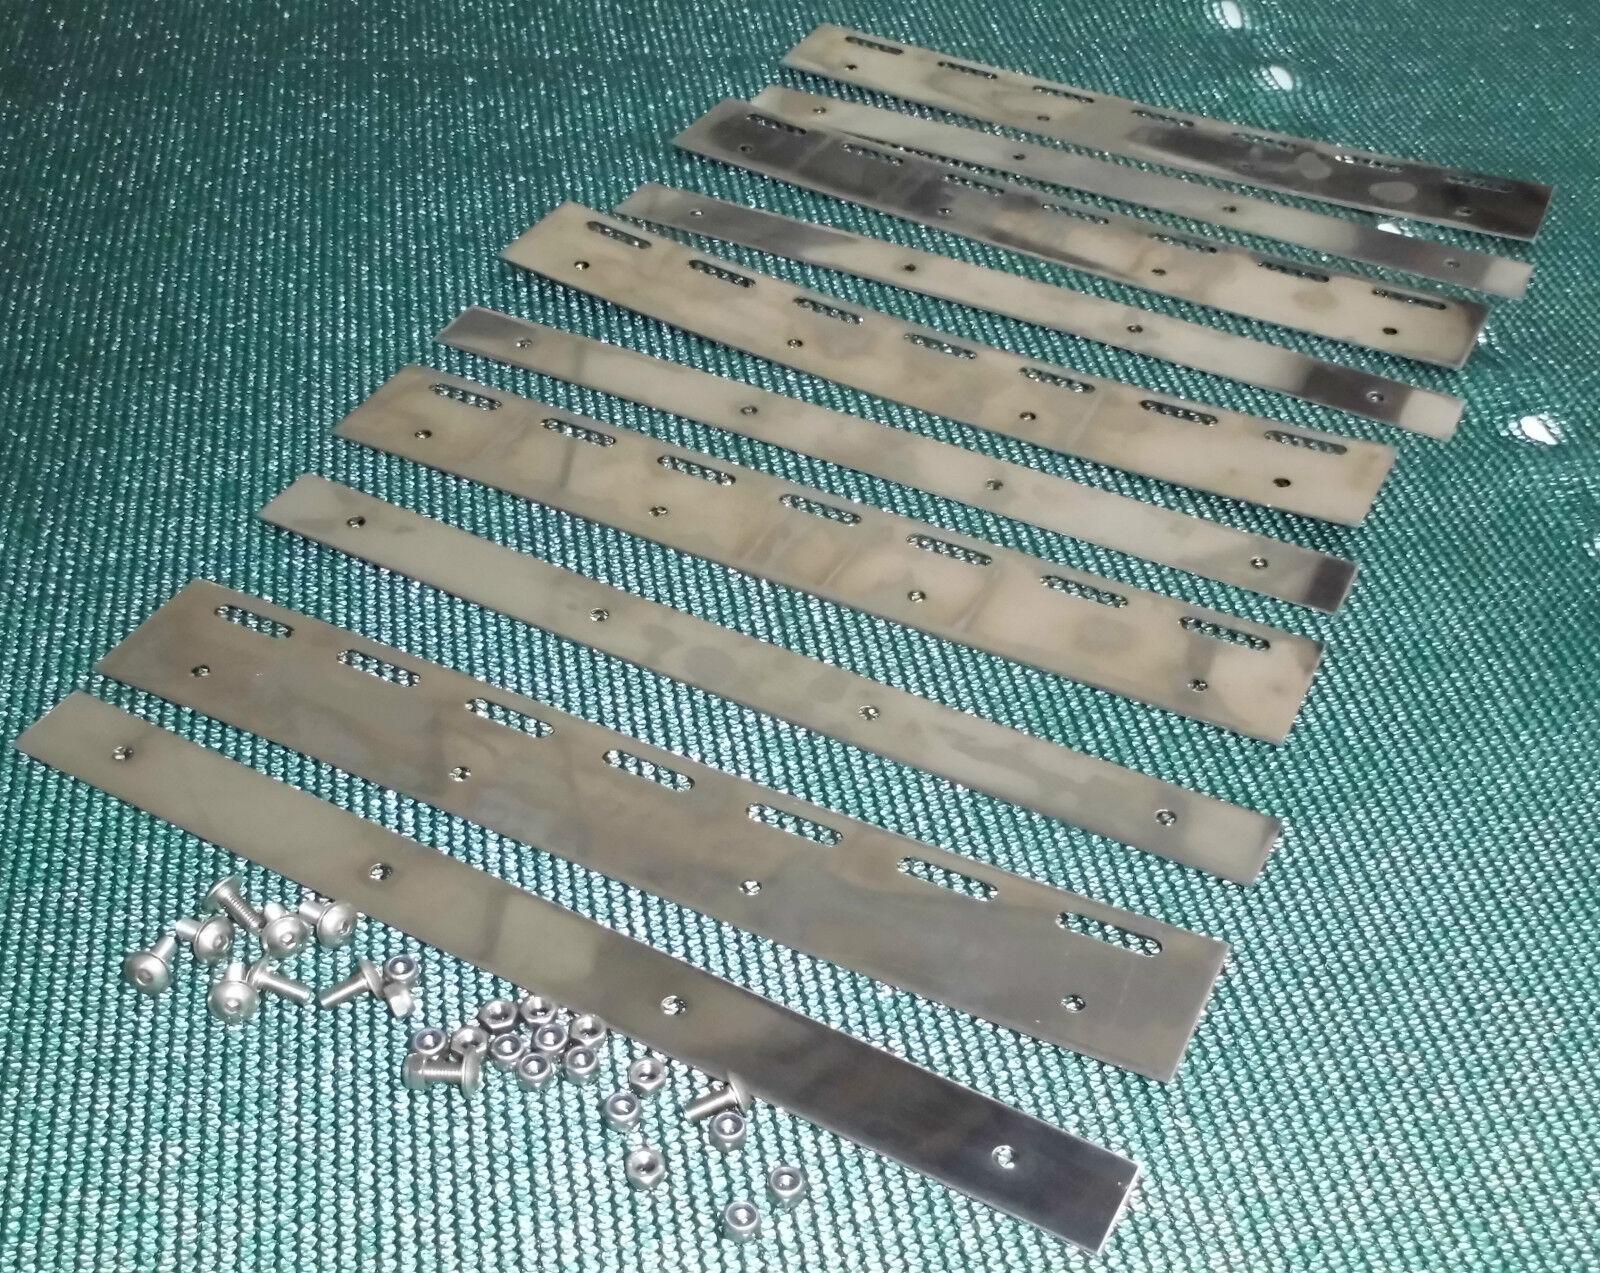 15 St. RICAMBIO befestigunsplatten pendolo lastre per blister PVClamelle sipario 30 cm